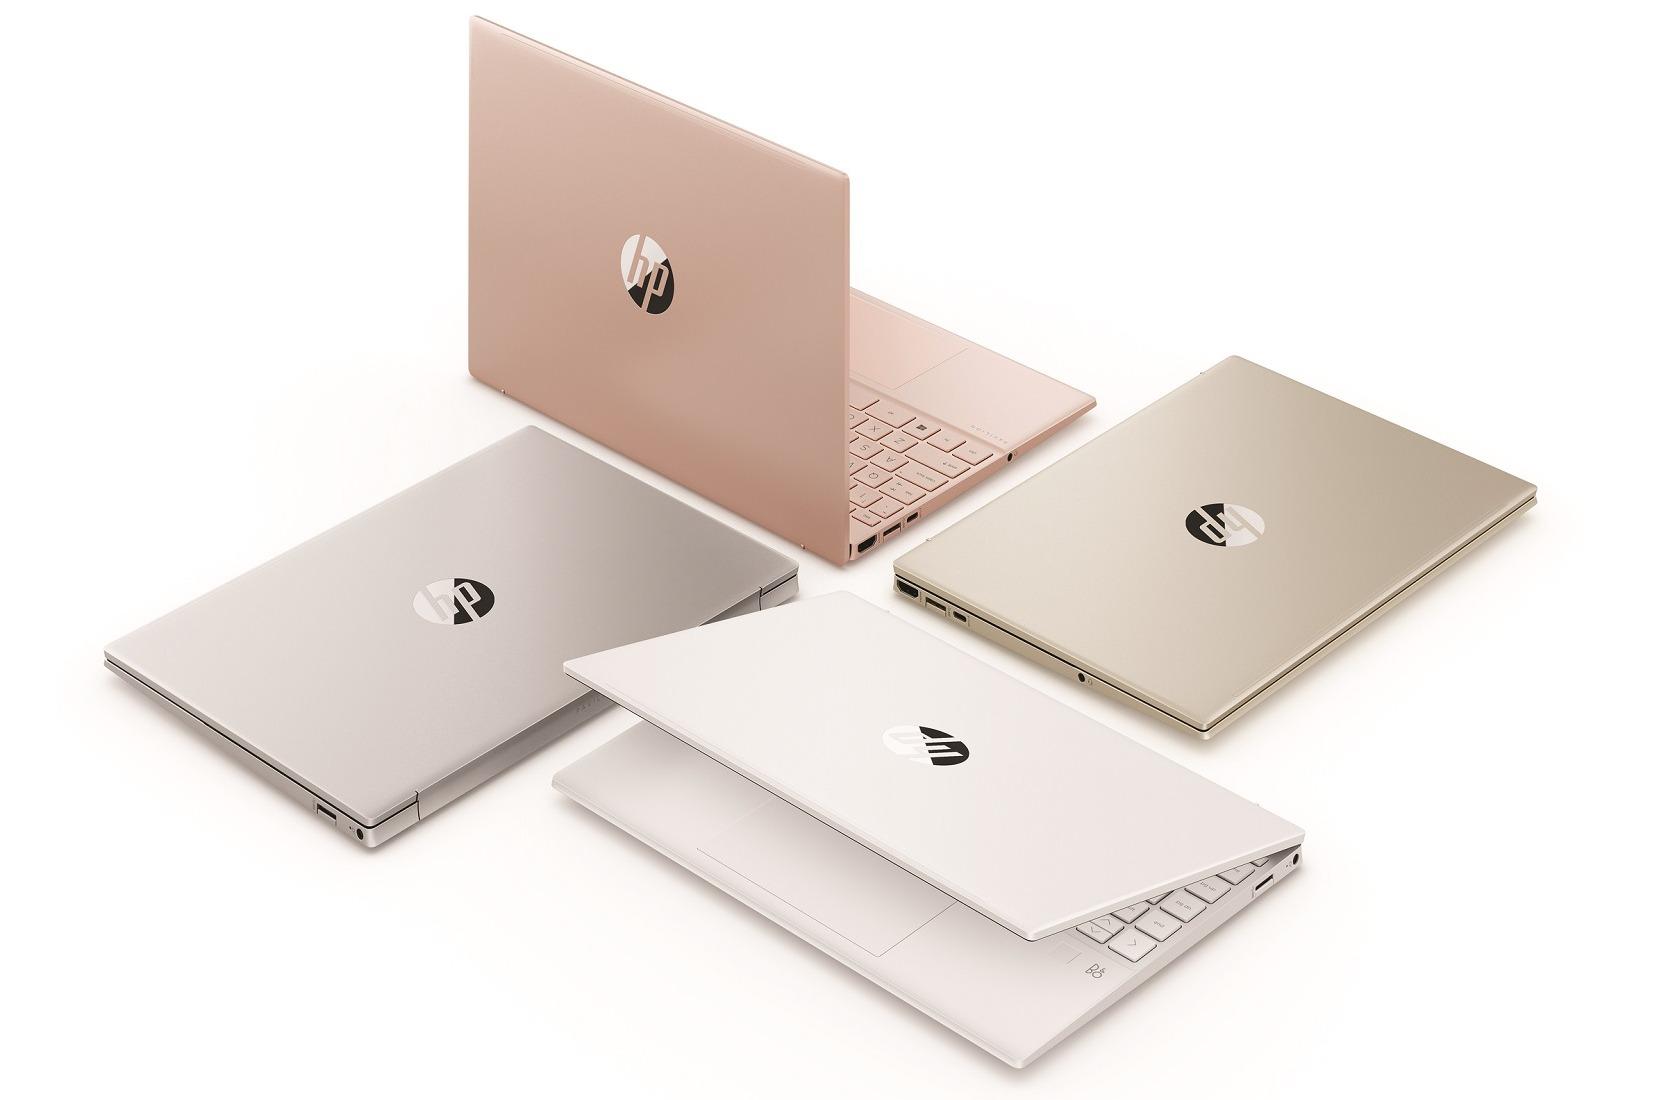 Portátil HP Pavilion Aero 13 Laptop PC